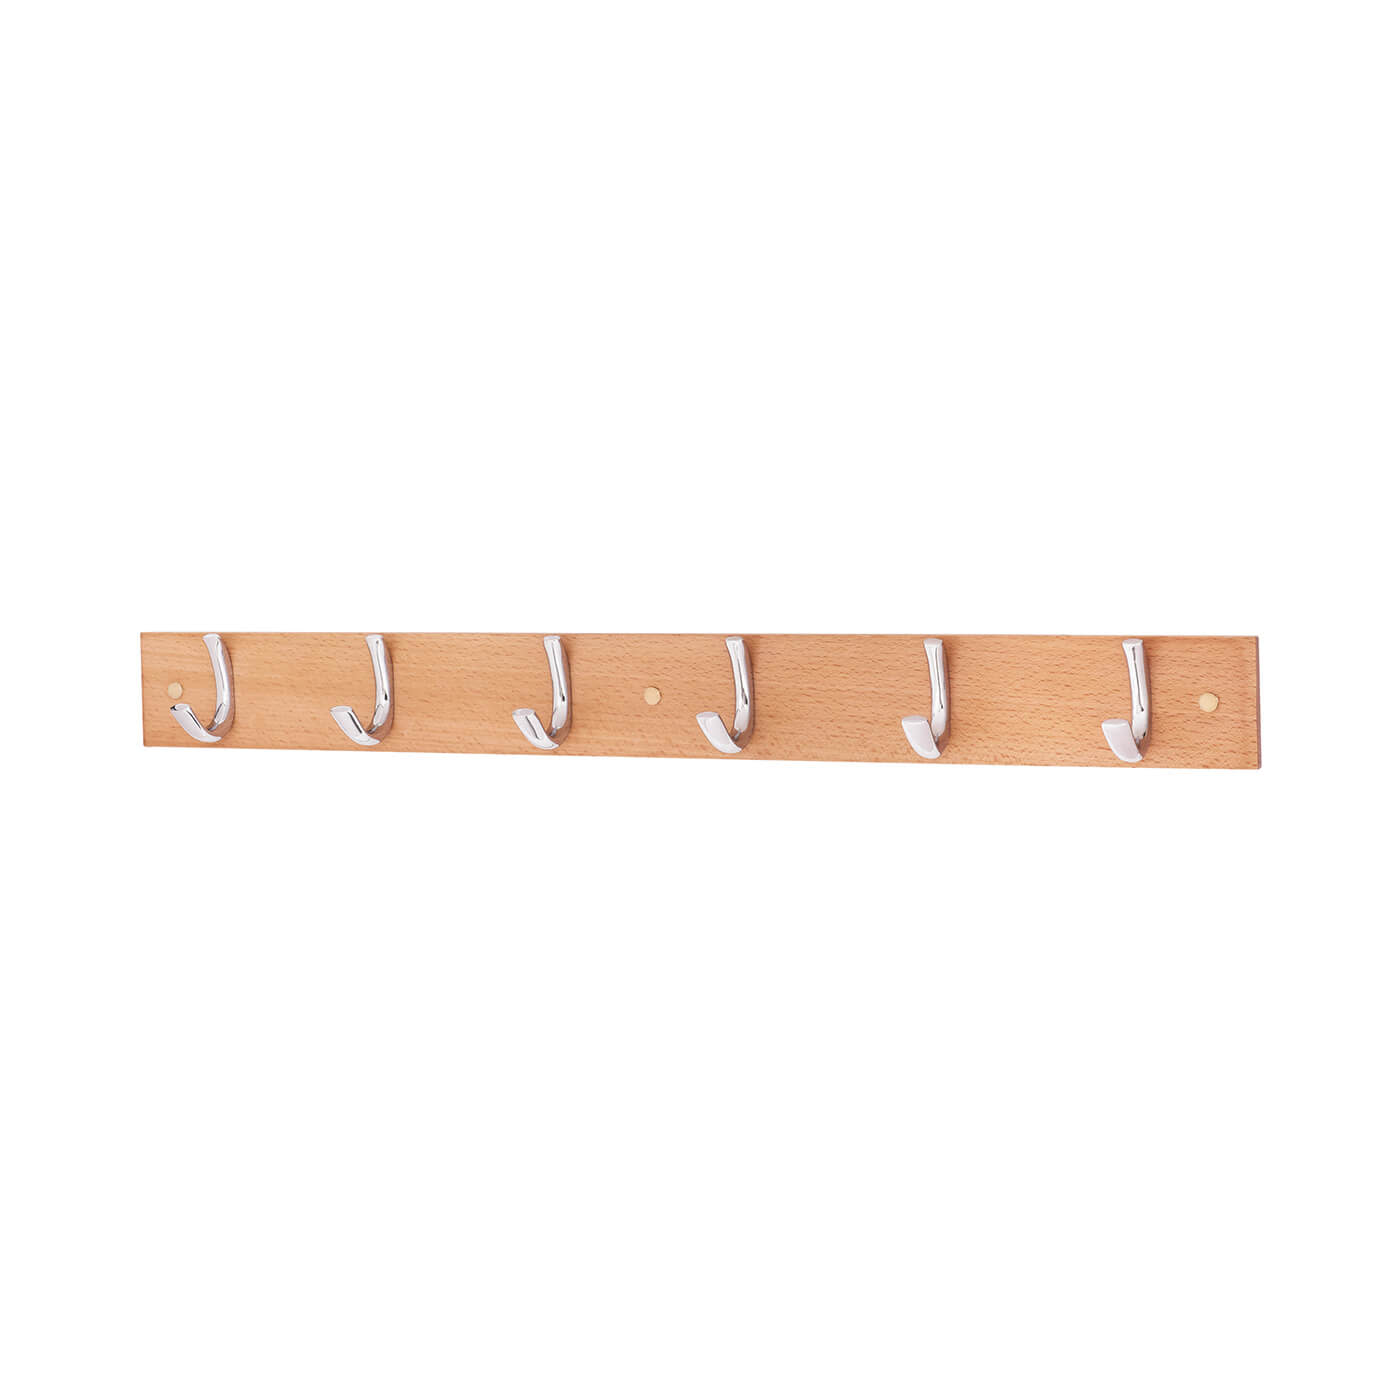 Coat Hook / Robe Hook Rail - 6 Hook - Wooden Board with Polished Chrome Hooks)